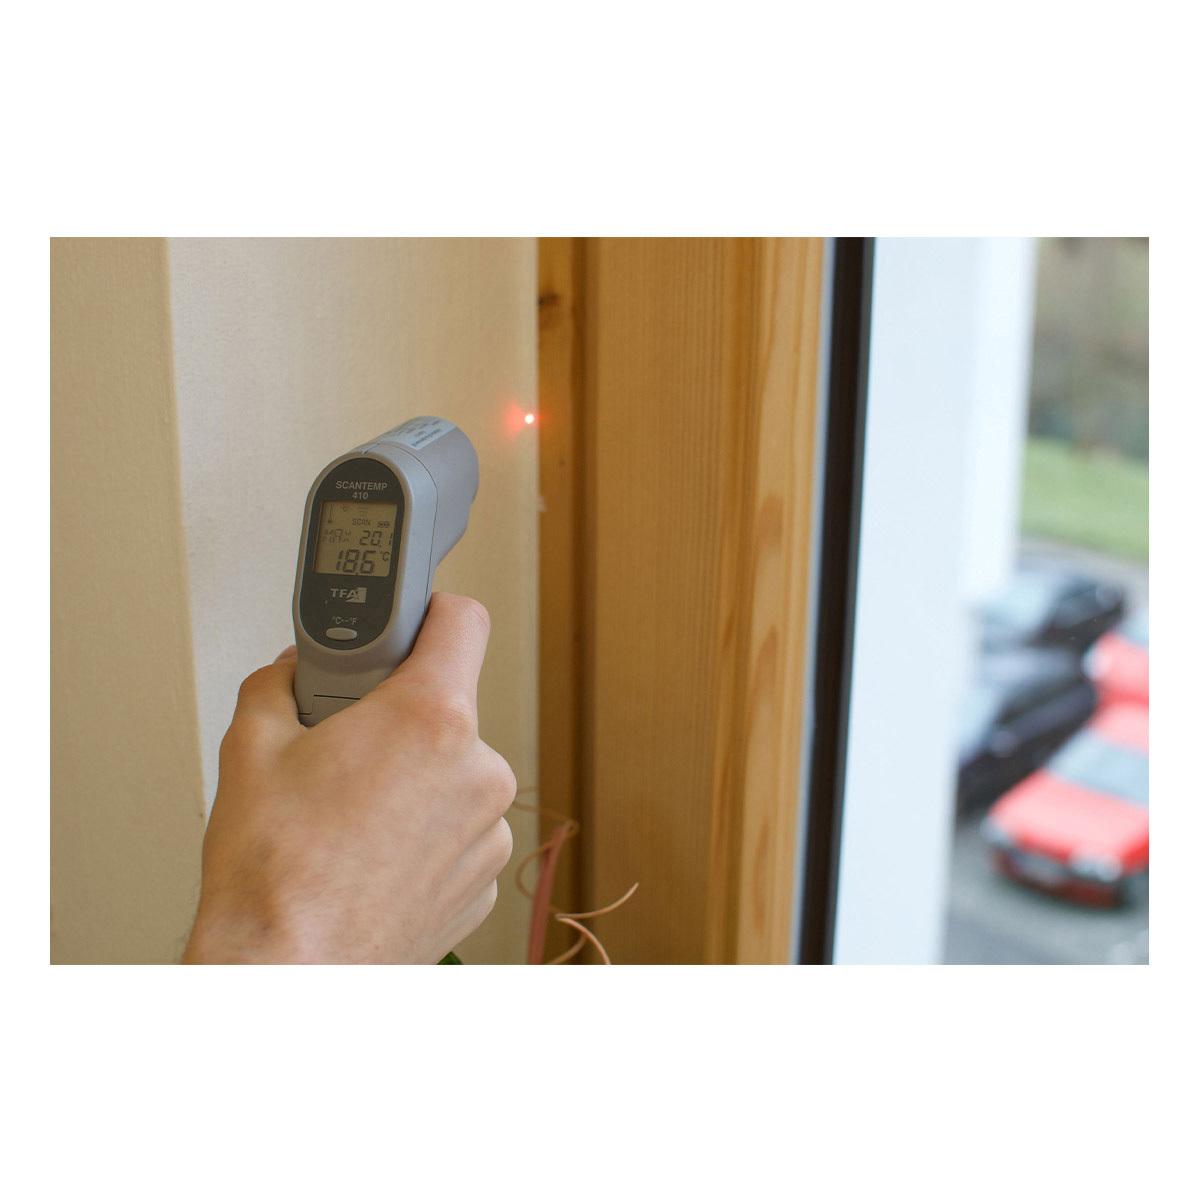 31-1115-infrarot-thermometer-scan-temp-410-anwendung1-1200x1200px.jpg